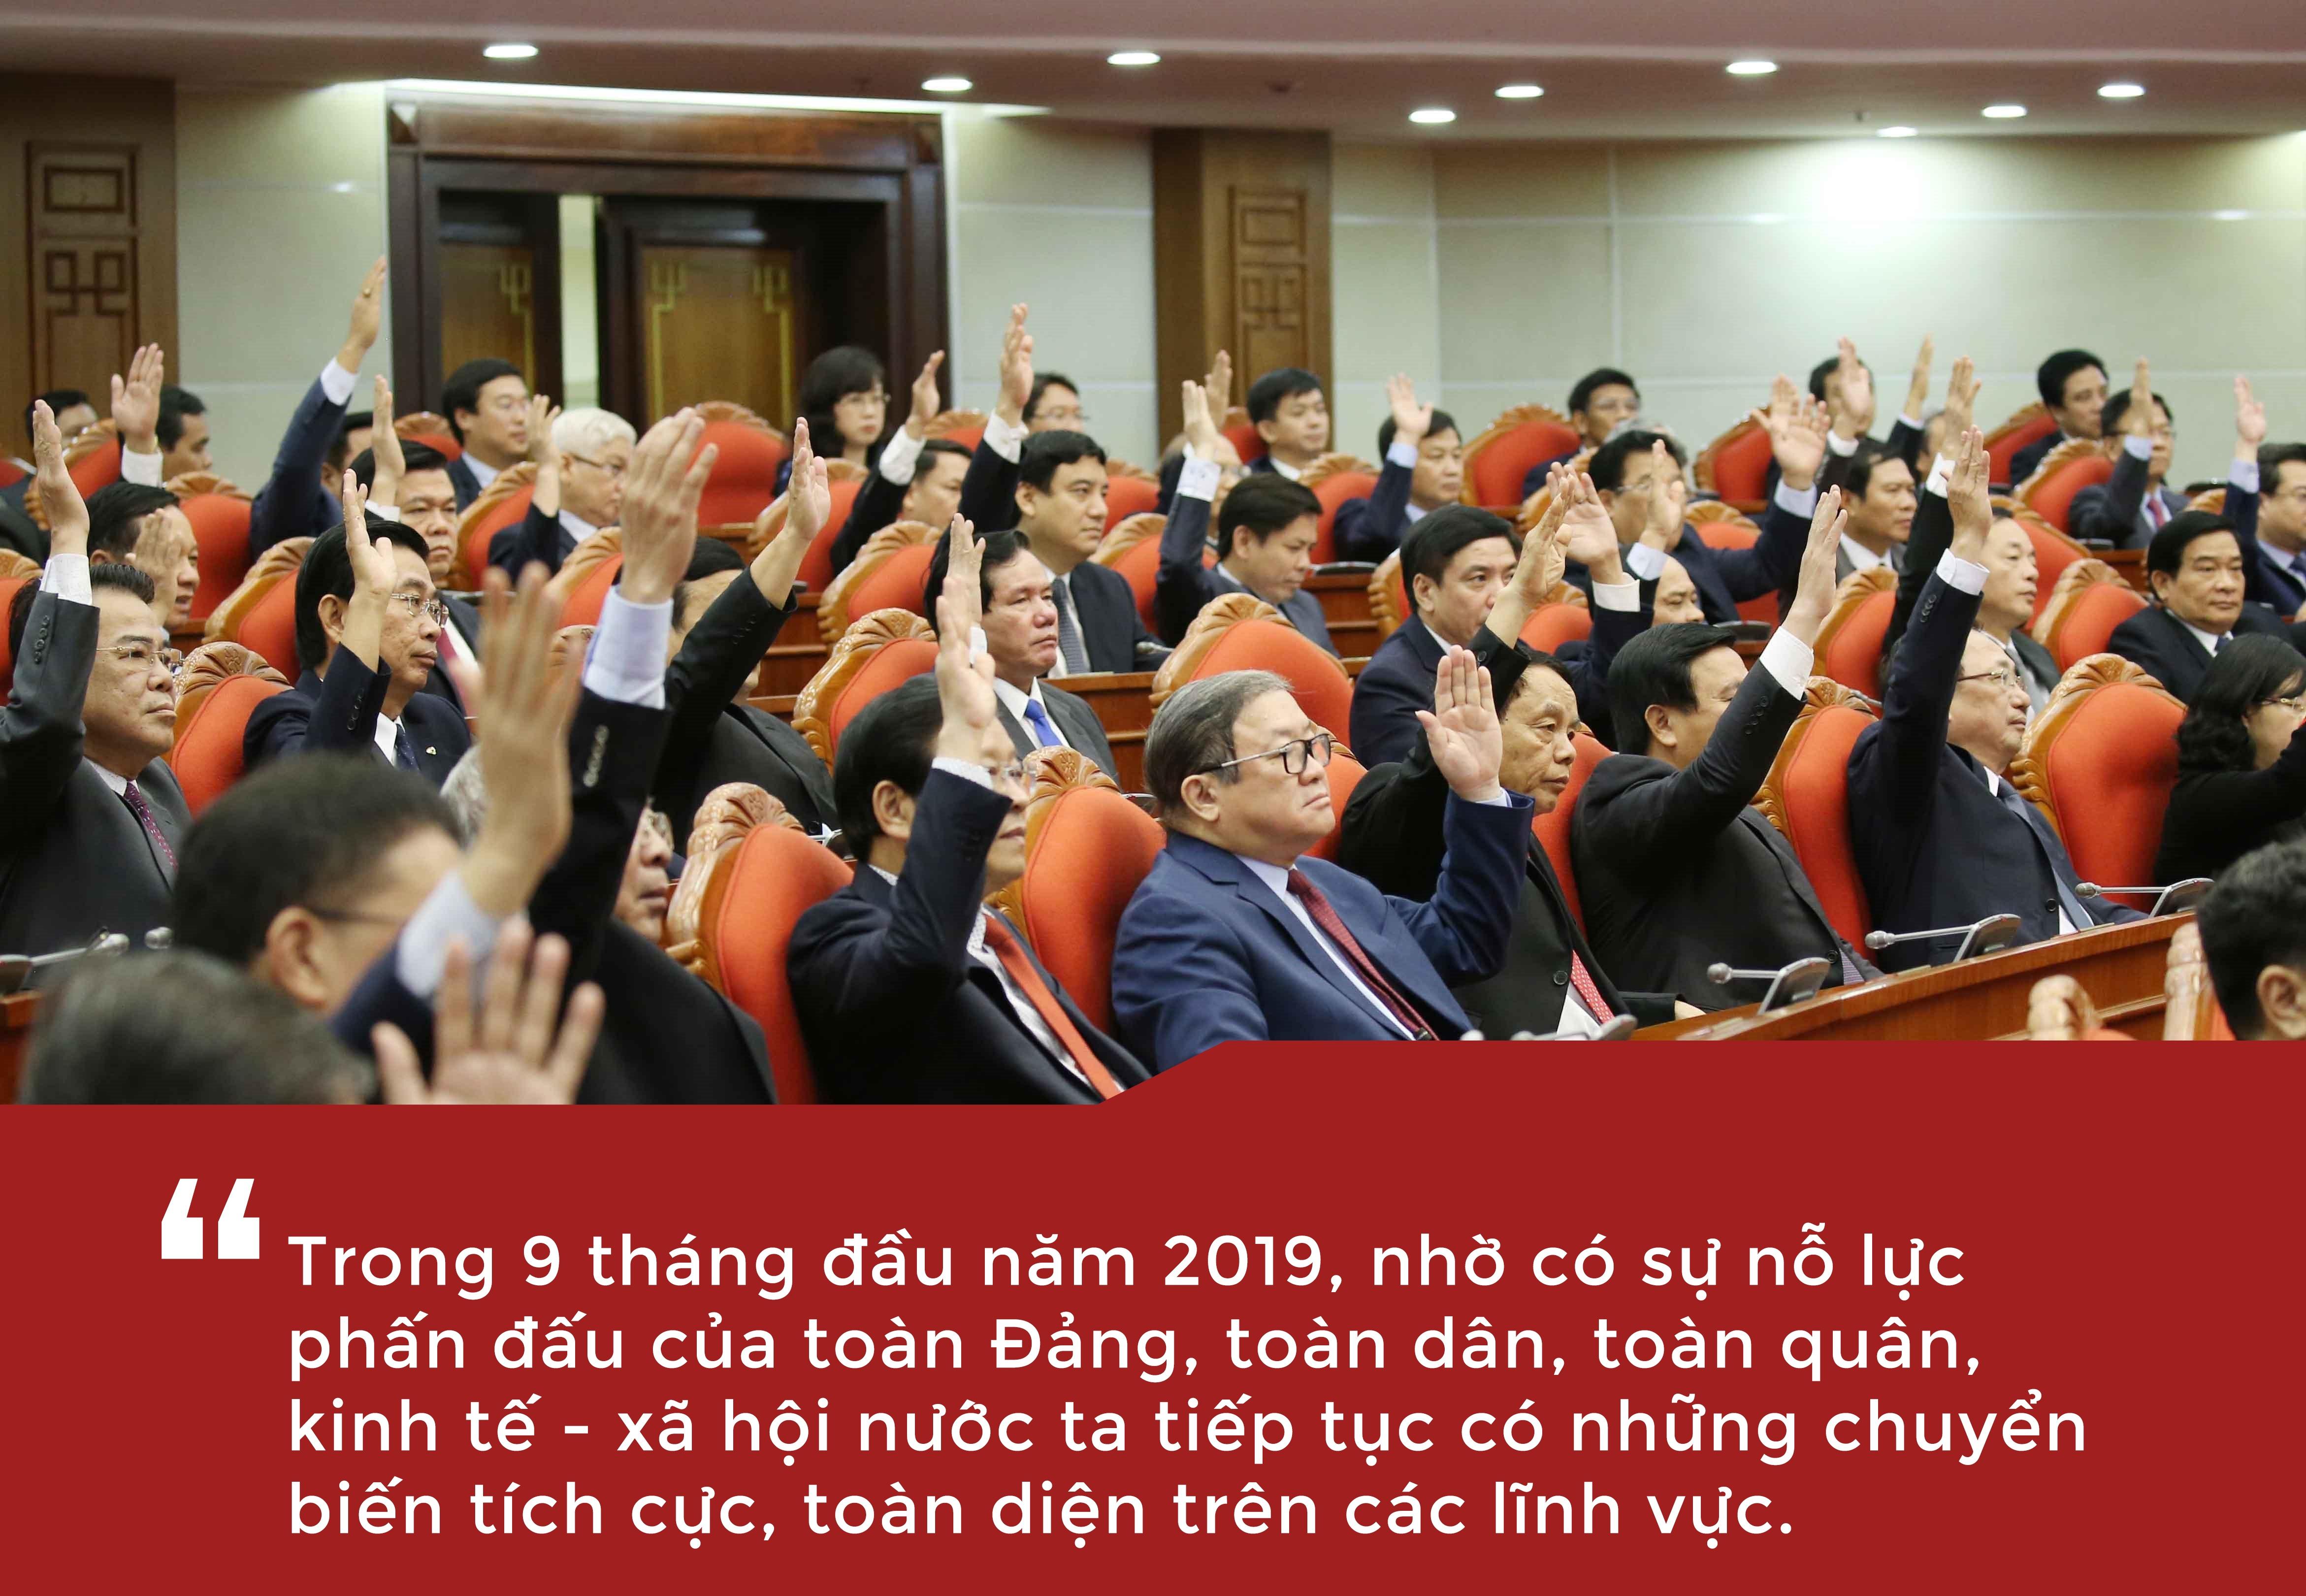 Tong bi thu: Ky luat can bo that dau xot, nhung khong co cach nao khac hinh anh 10